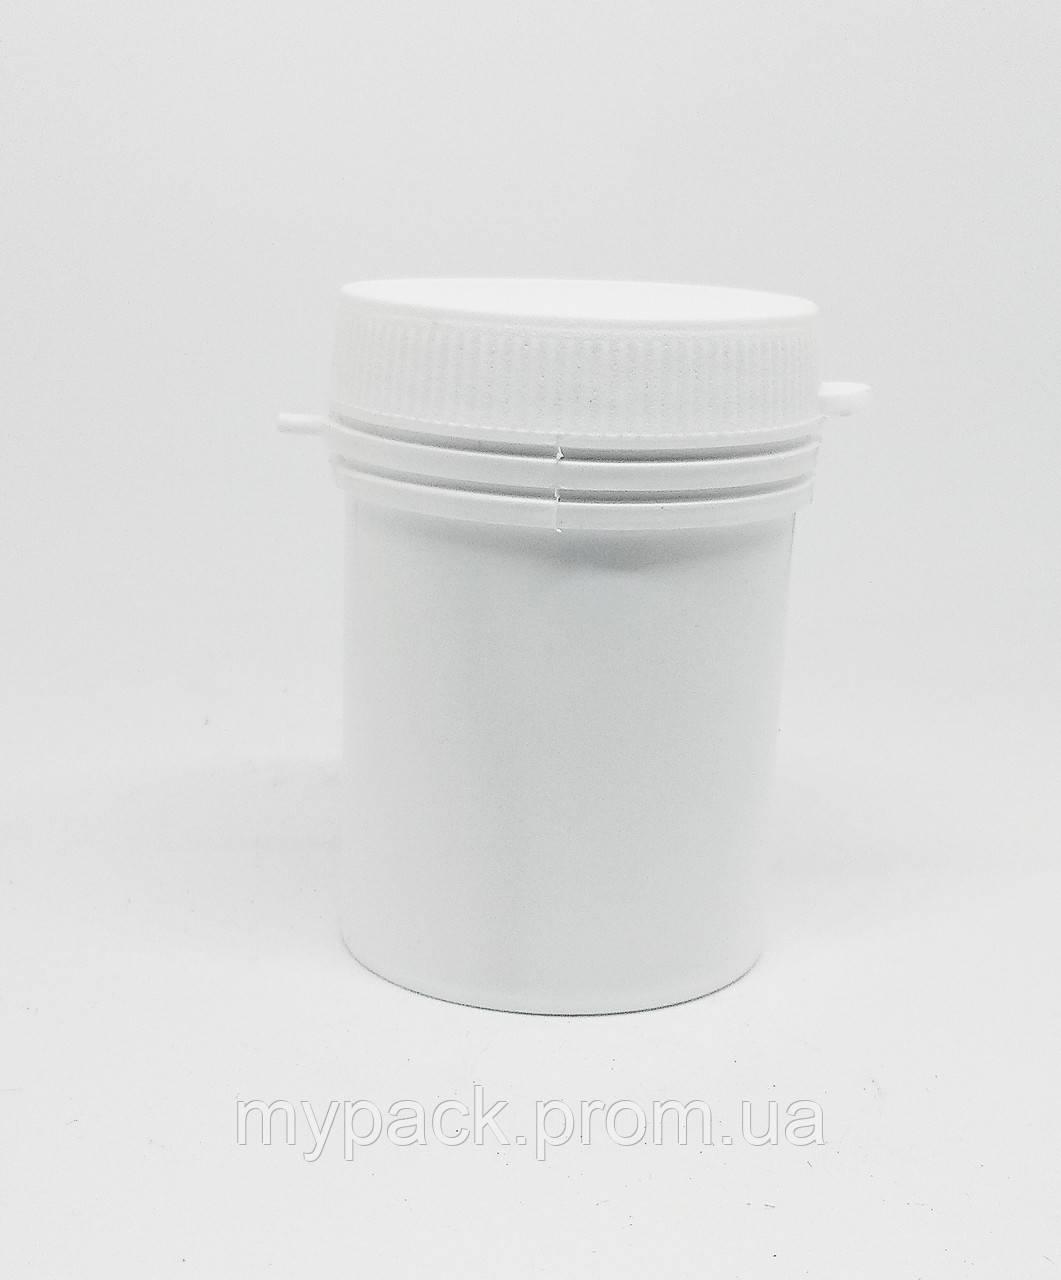 Контейнер медицинский 50мл А50 - 500 шт